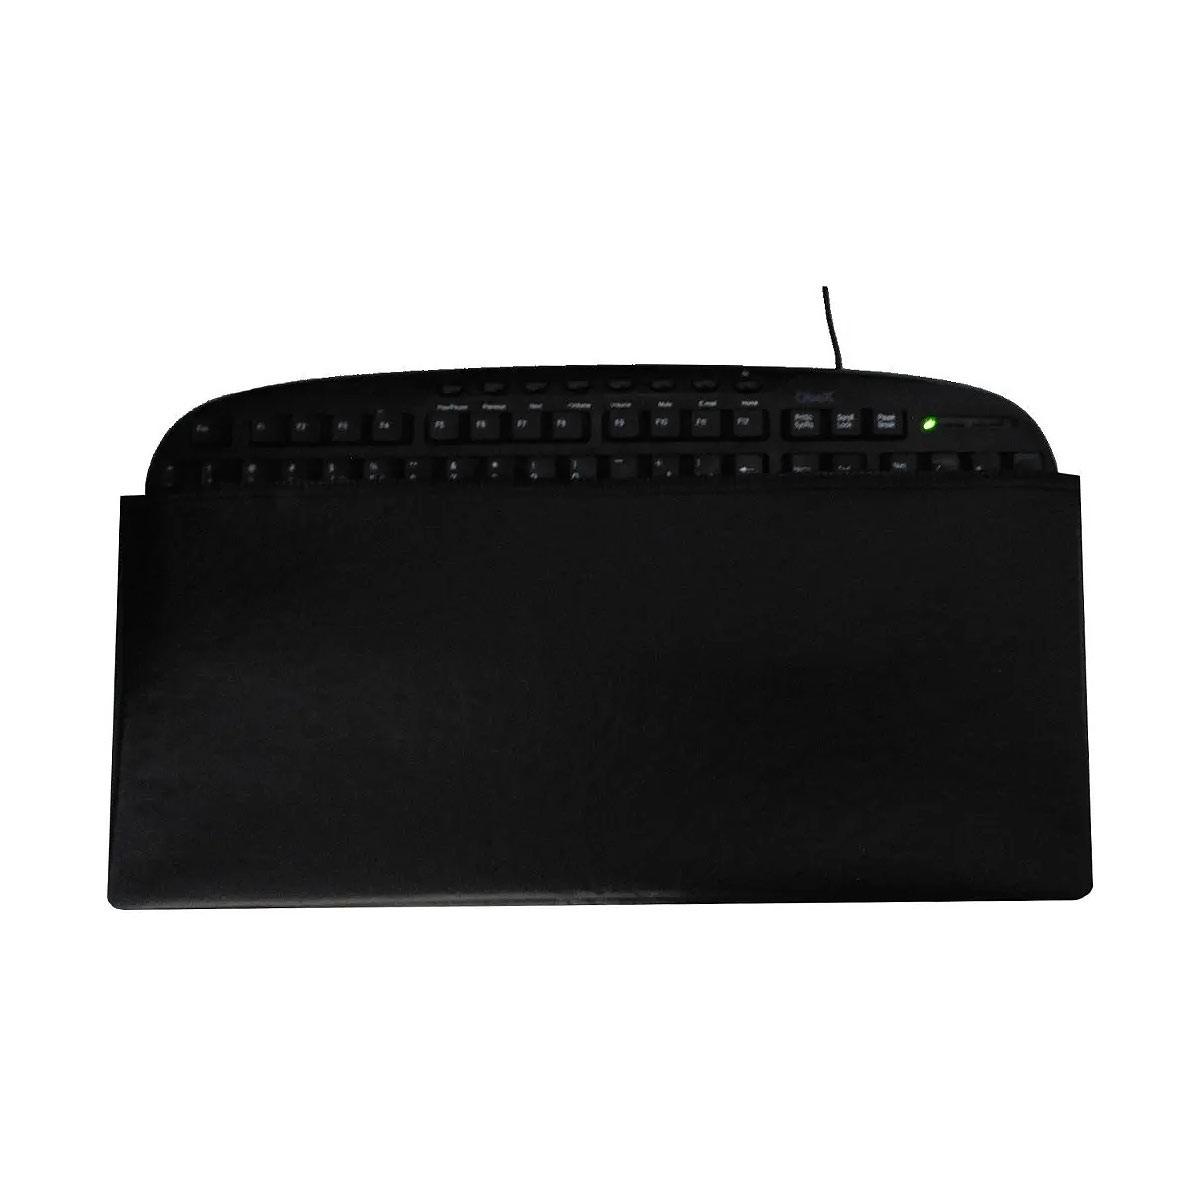 Kit Capa Para Cpu, Monitor, Teclado E Mouse - Em Corino